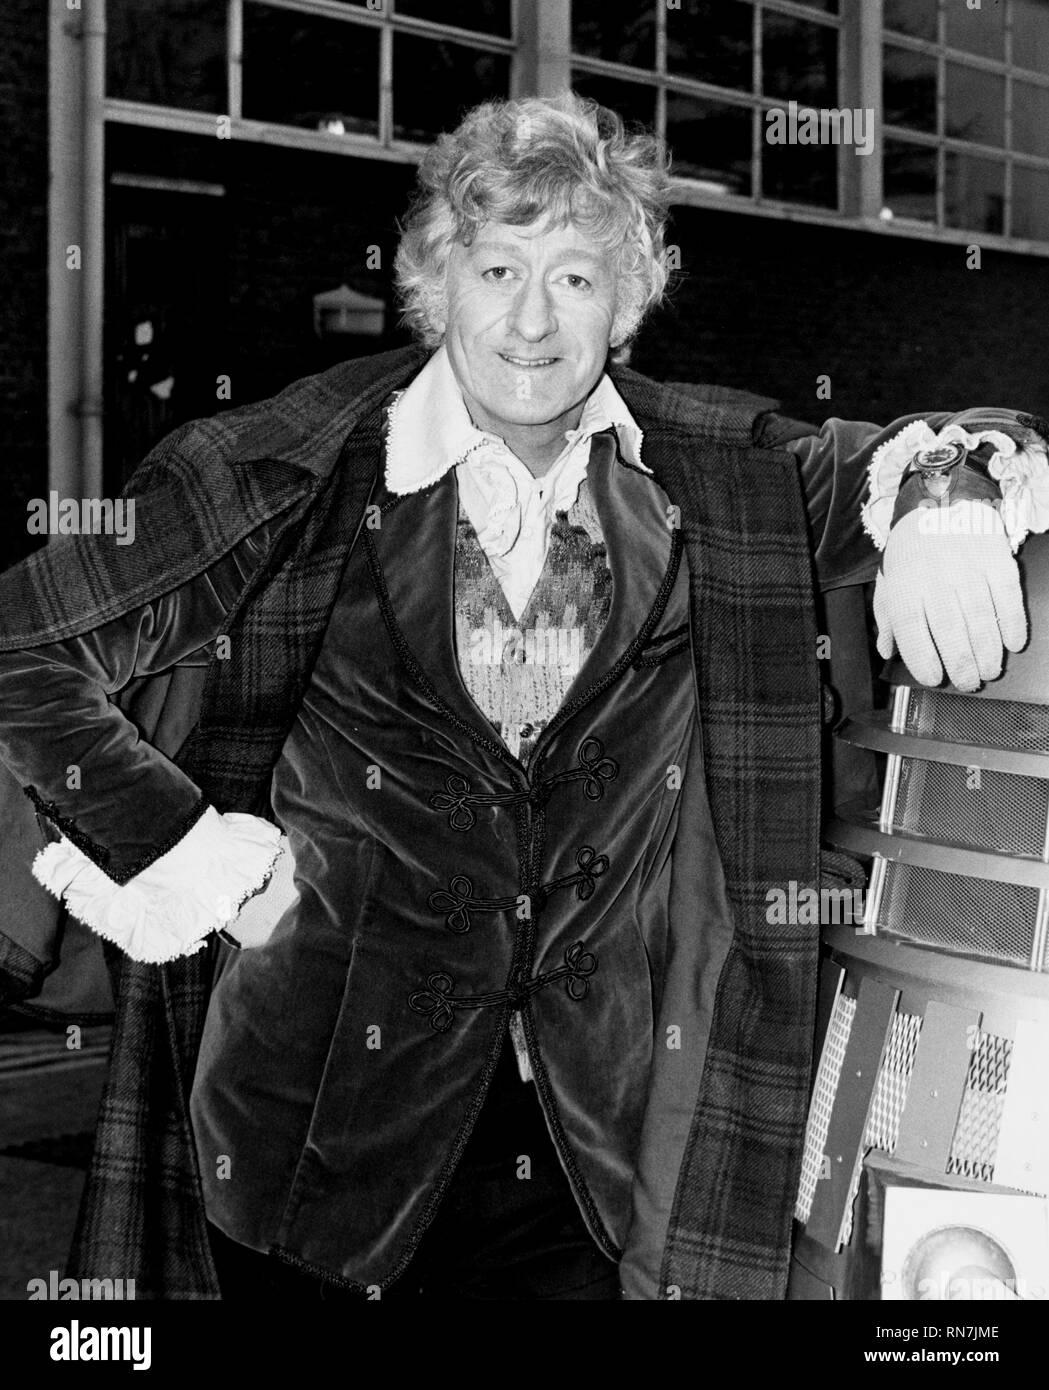 JOHN PERTWEE, DR WHO, 1970 - Stock Image